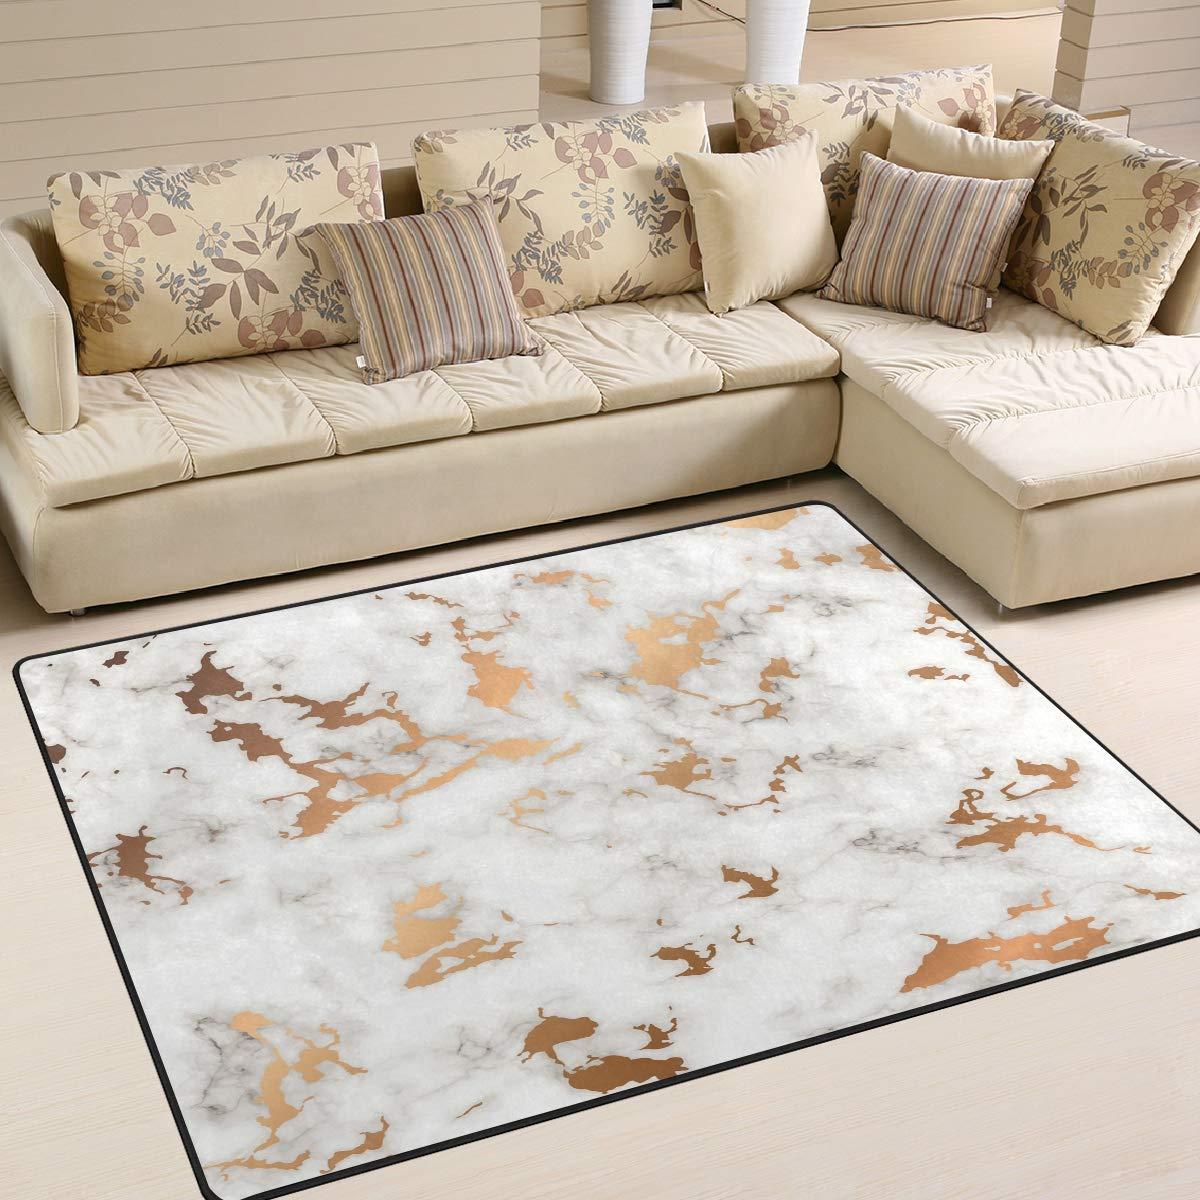 ALAZA Marble Golden Splatter Spots Black and White Indoor Modern Area Rug 4' x 5', Dining Room Home Bedroom Carpet Floor Mat Nursery Rug Room Mat